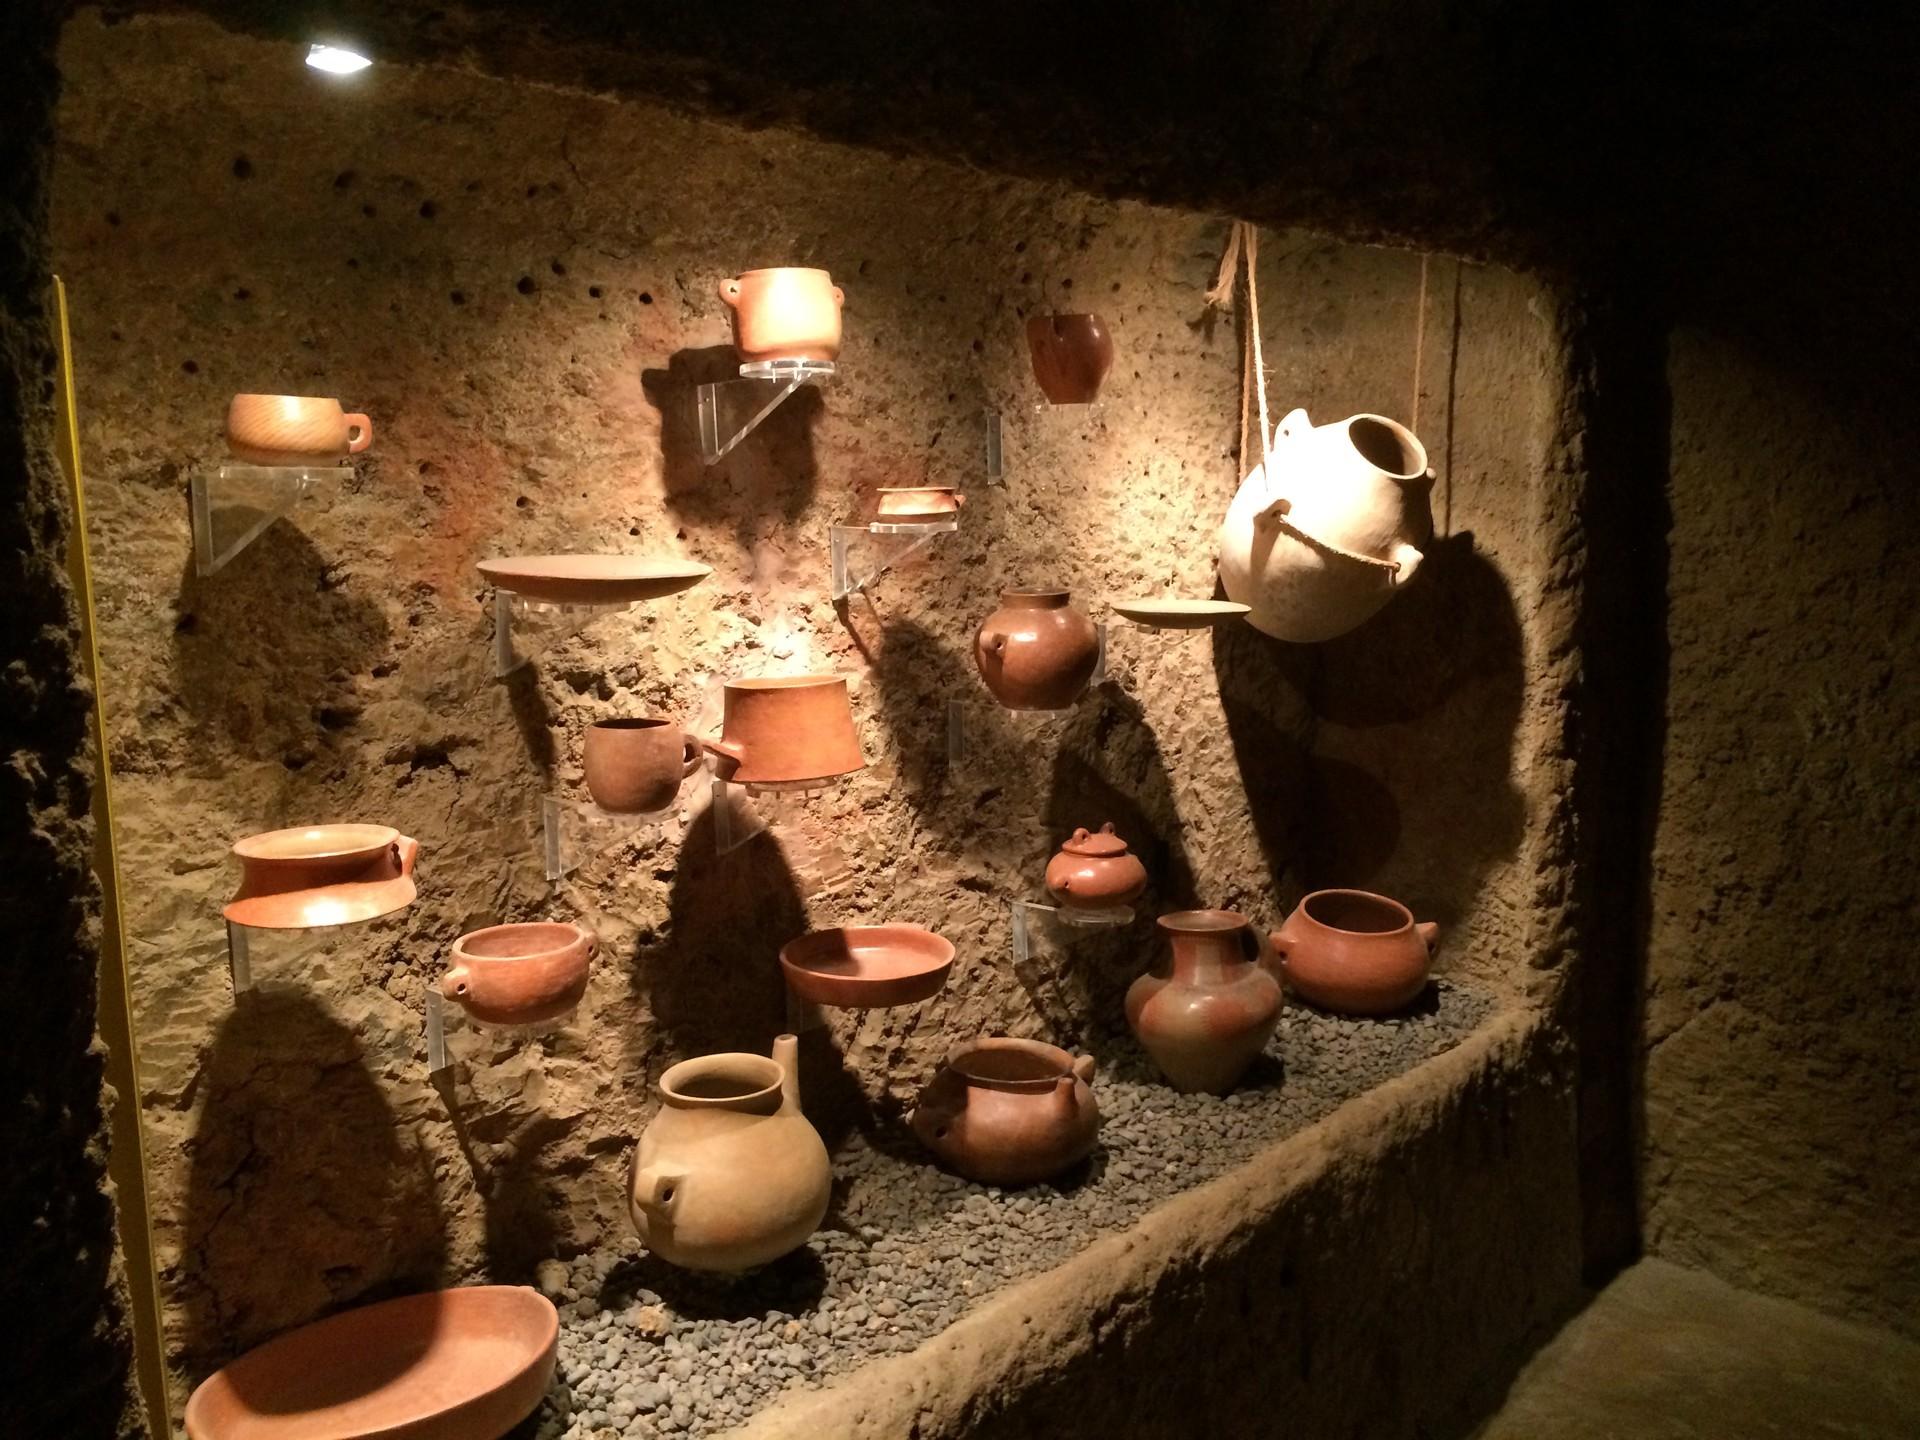 museo-guayadeque-0b204c1c294aeda8bde39bf